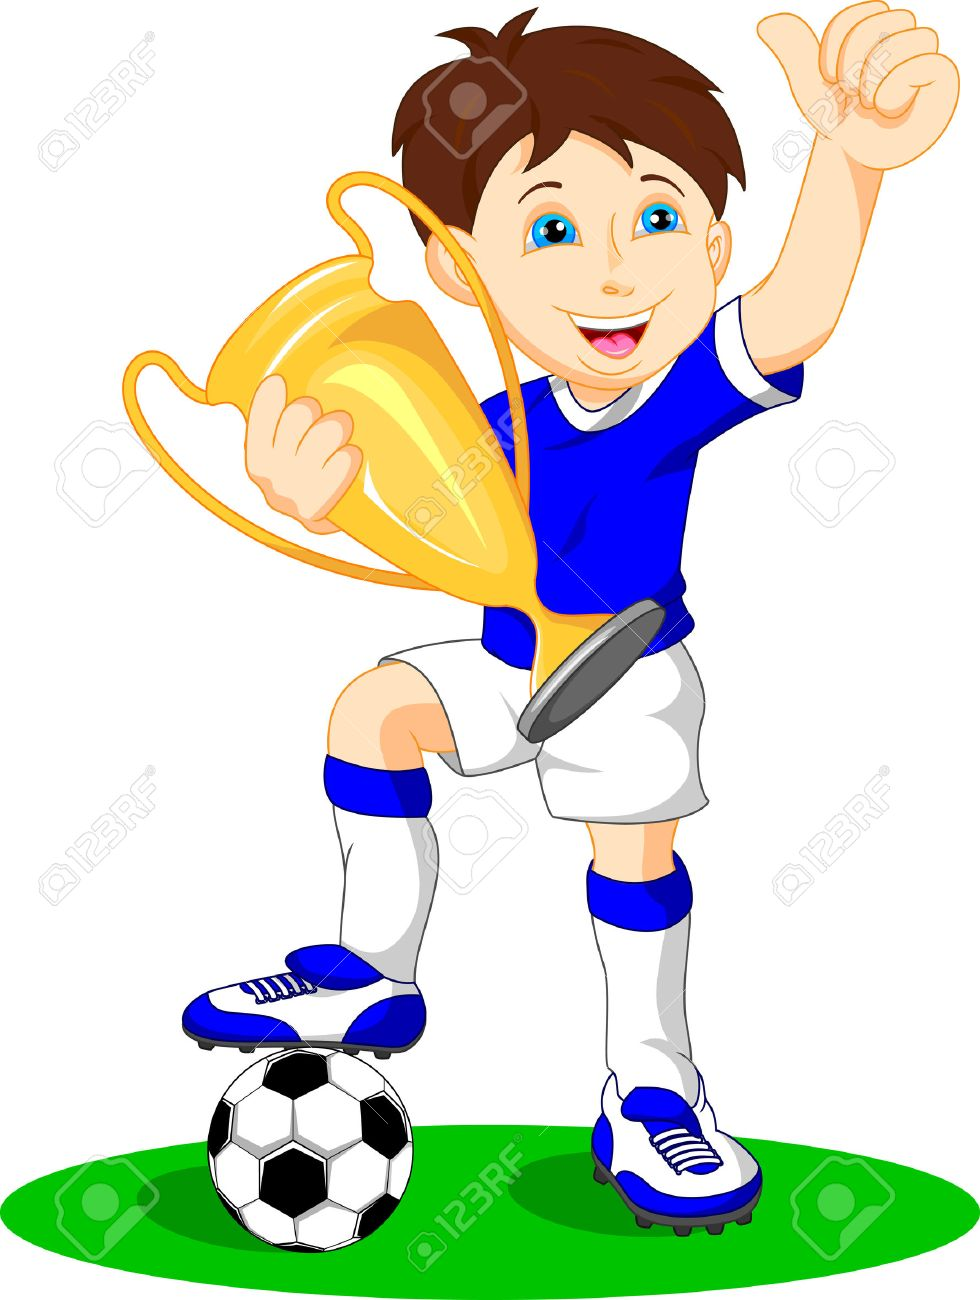 Footballer Clipart 4-footballer clipart 4-8